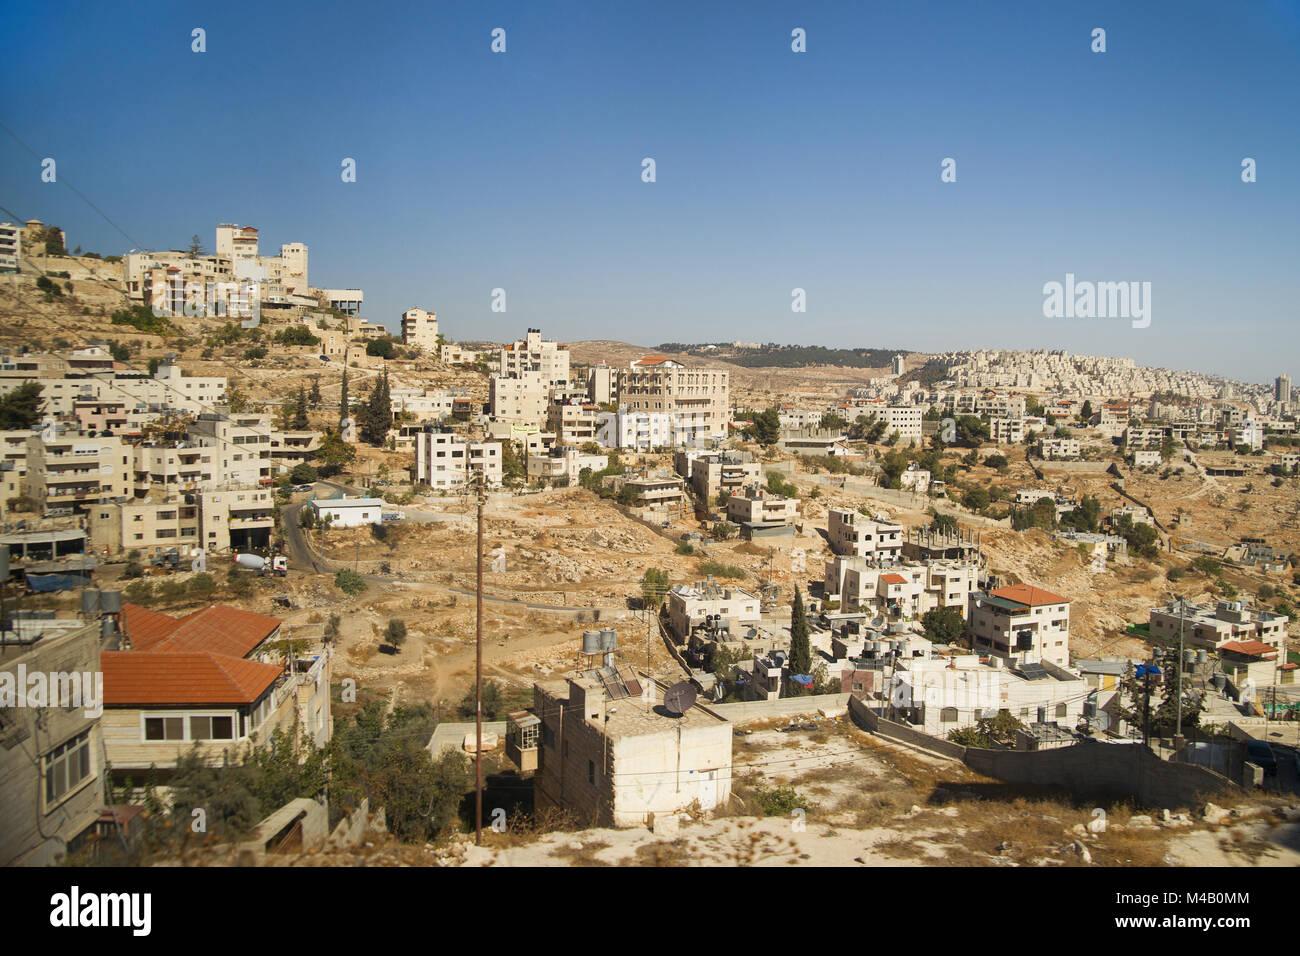 Neighbourhoods of Bethlehem on hill under clear sky - Stock Image